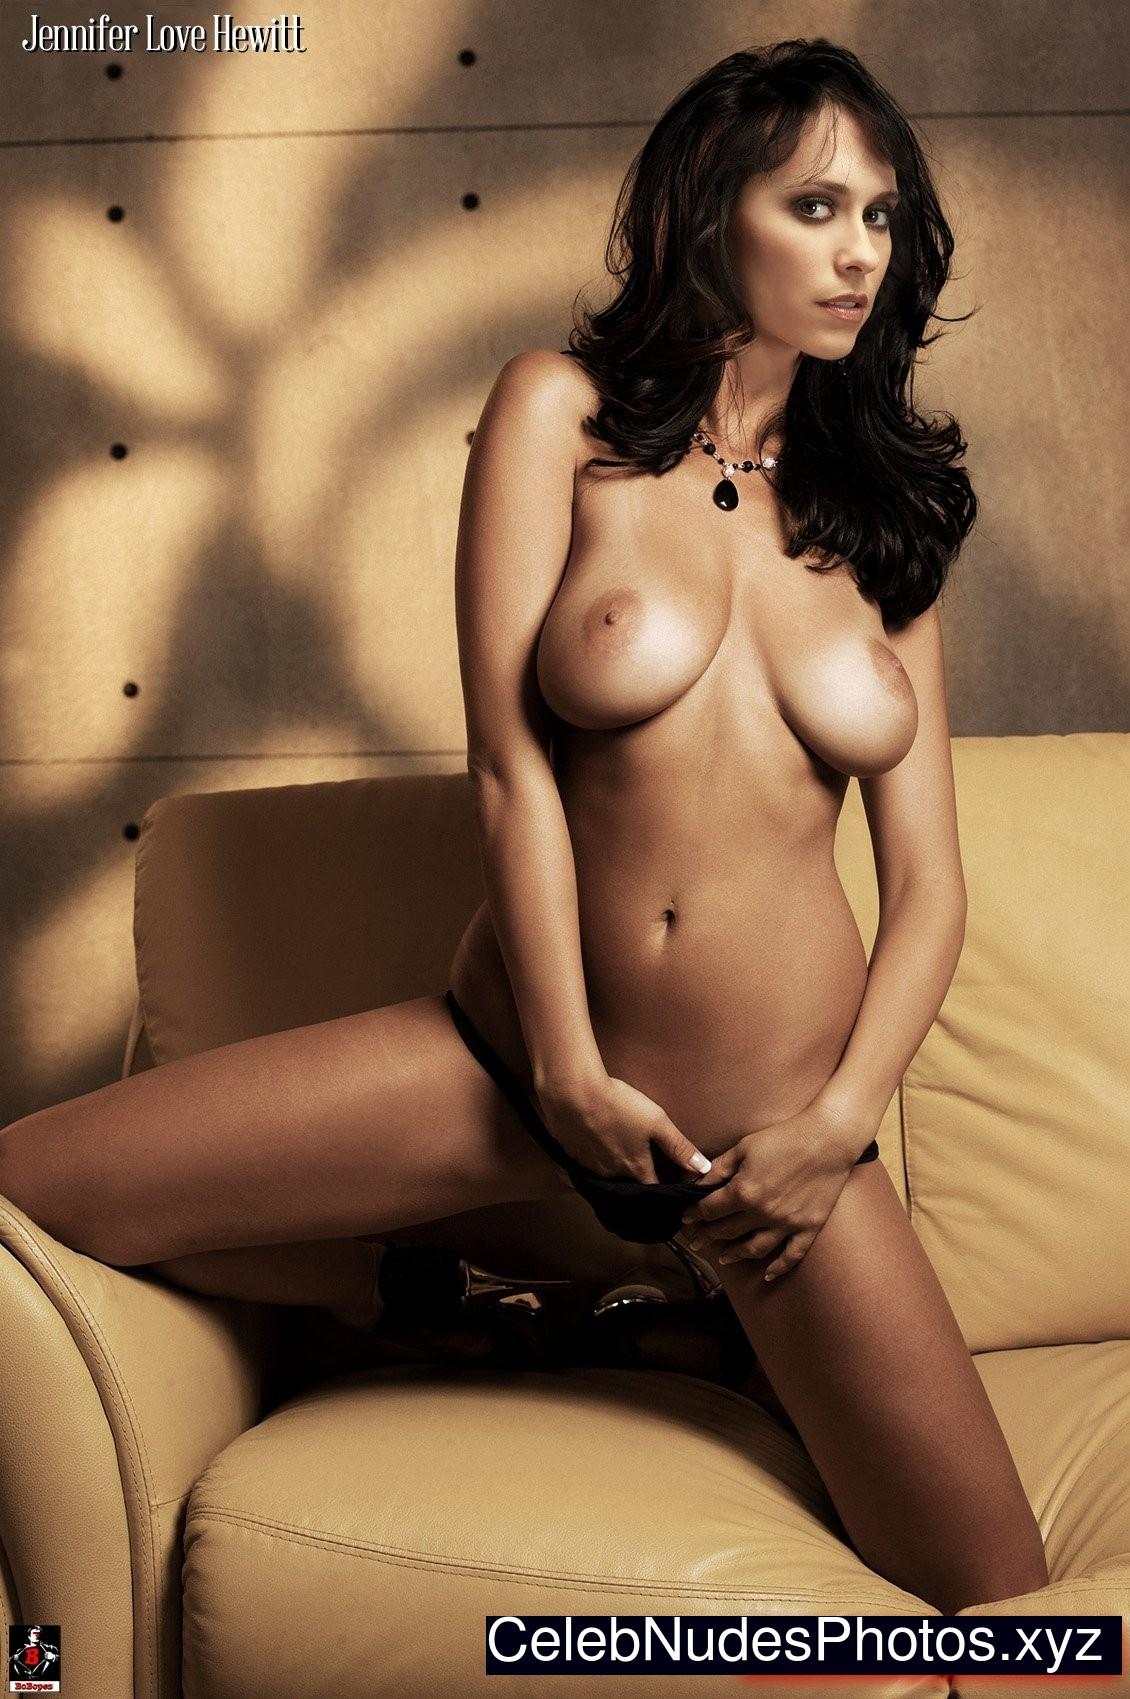 jennifer love hewitt nude topless